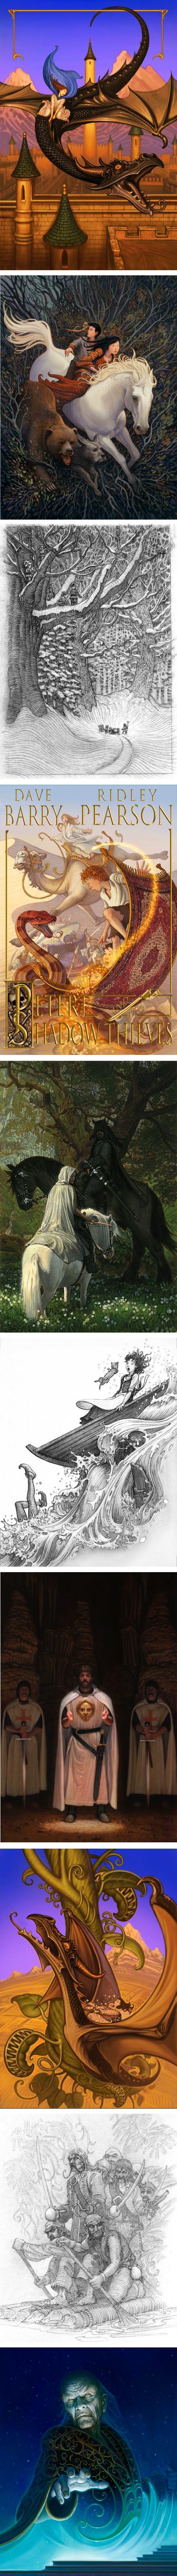 Greg Call, fantasy and adventure illustration